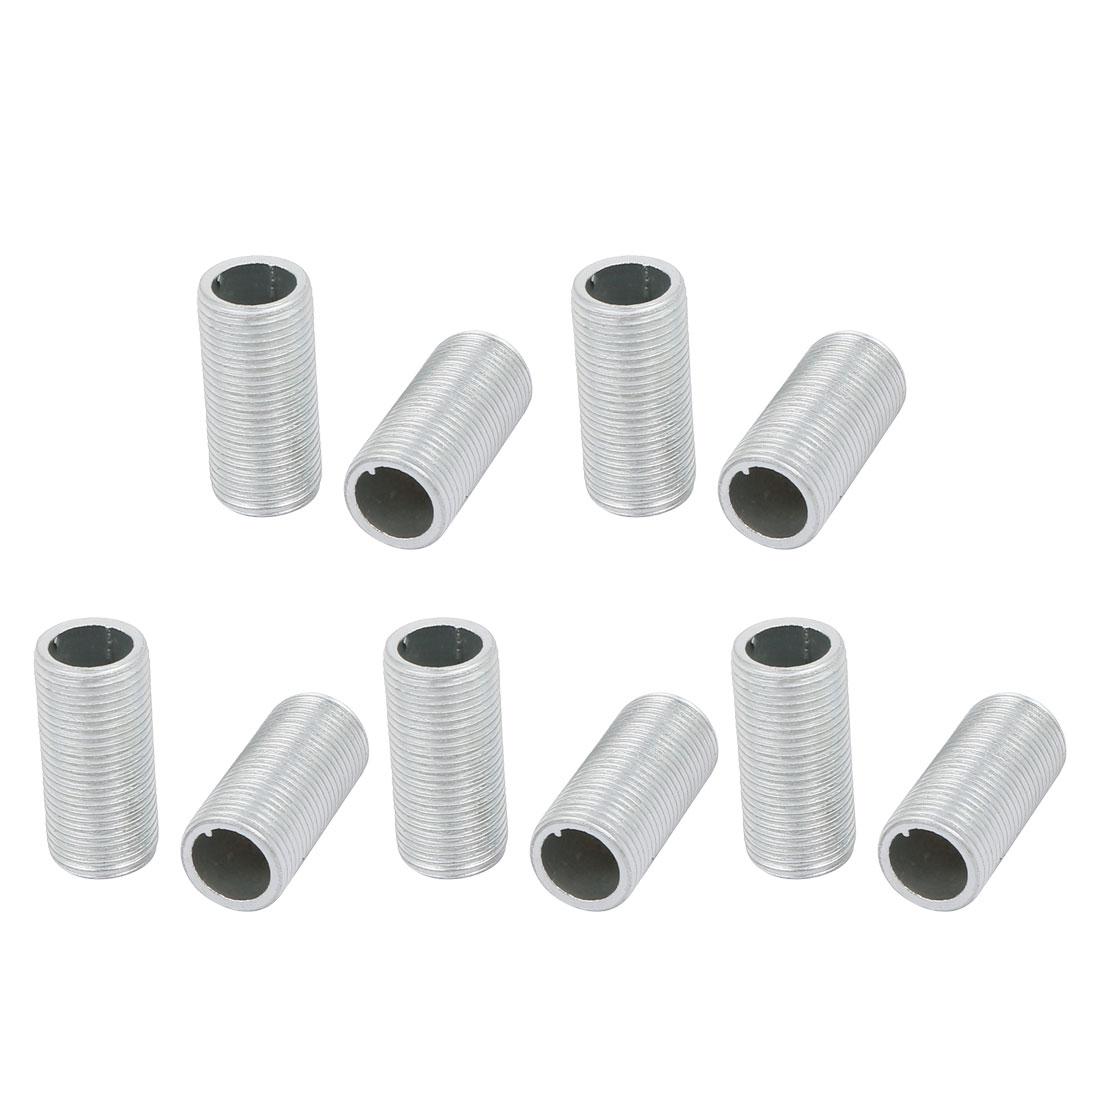 10Pcs M12 Full Threaded Lamp Nipple Pass-Through Pipe Connector 25mm Length